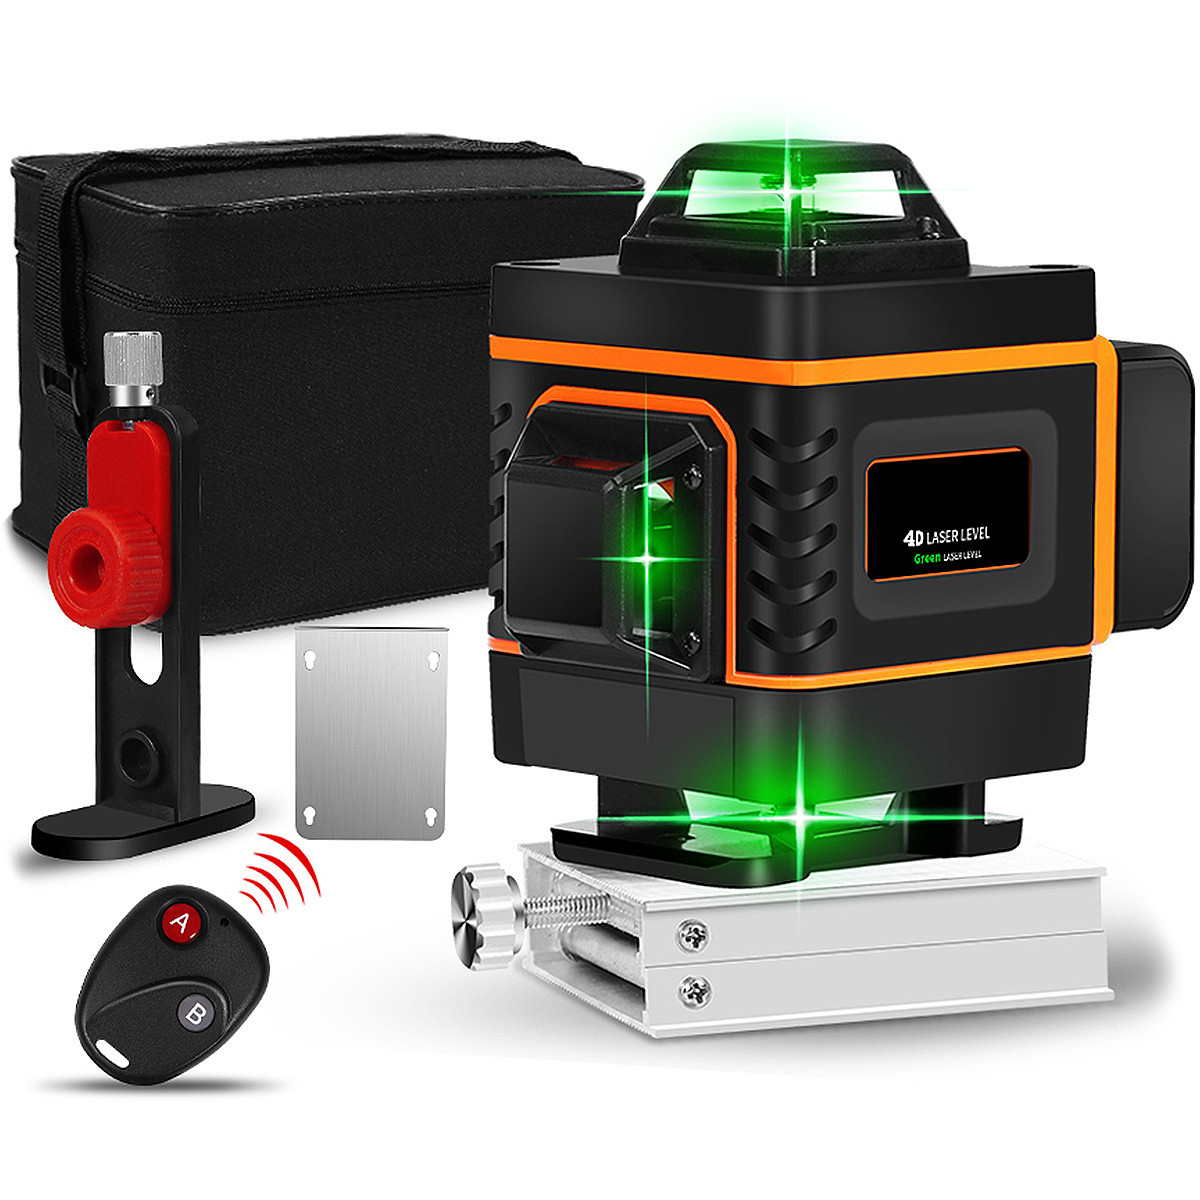 Poziomica laserowa 360°